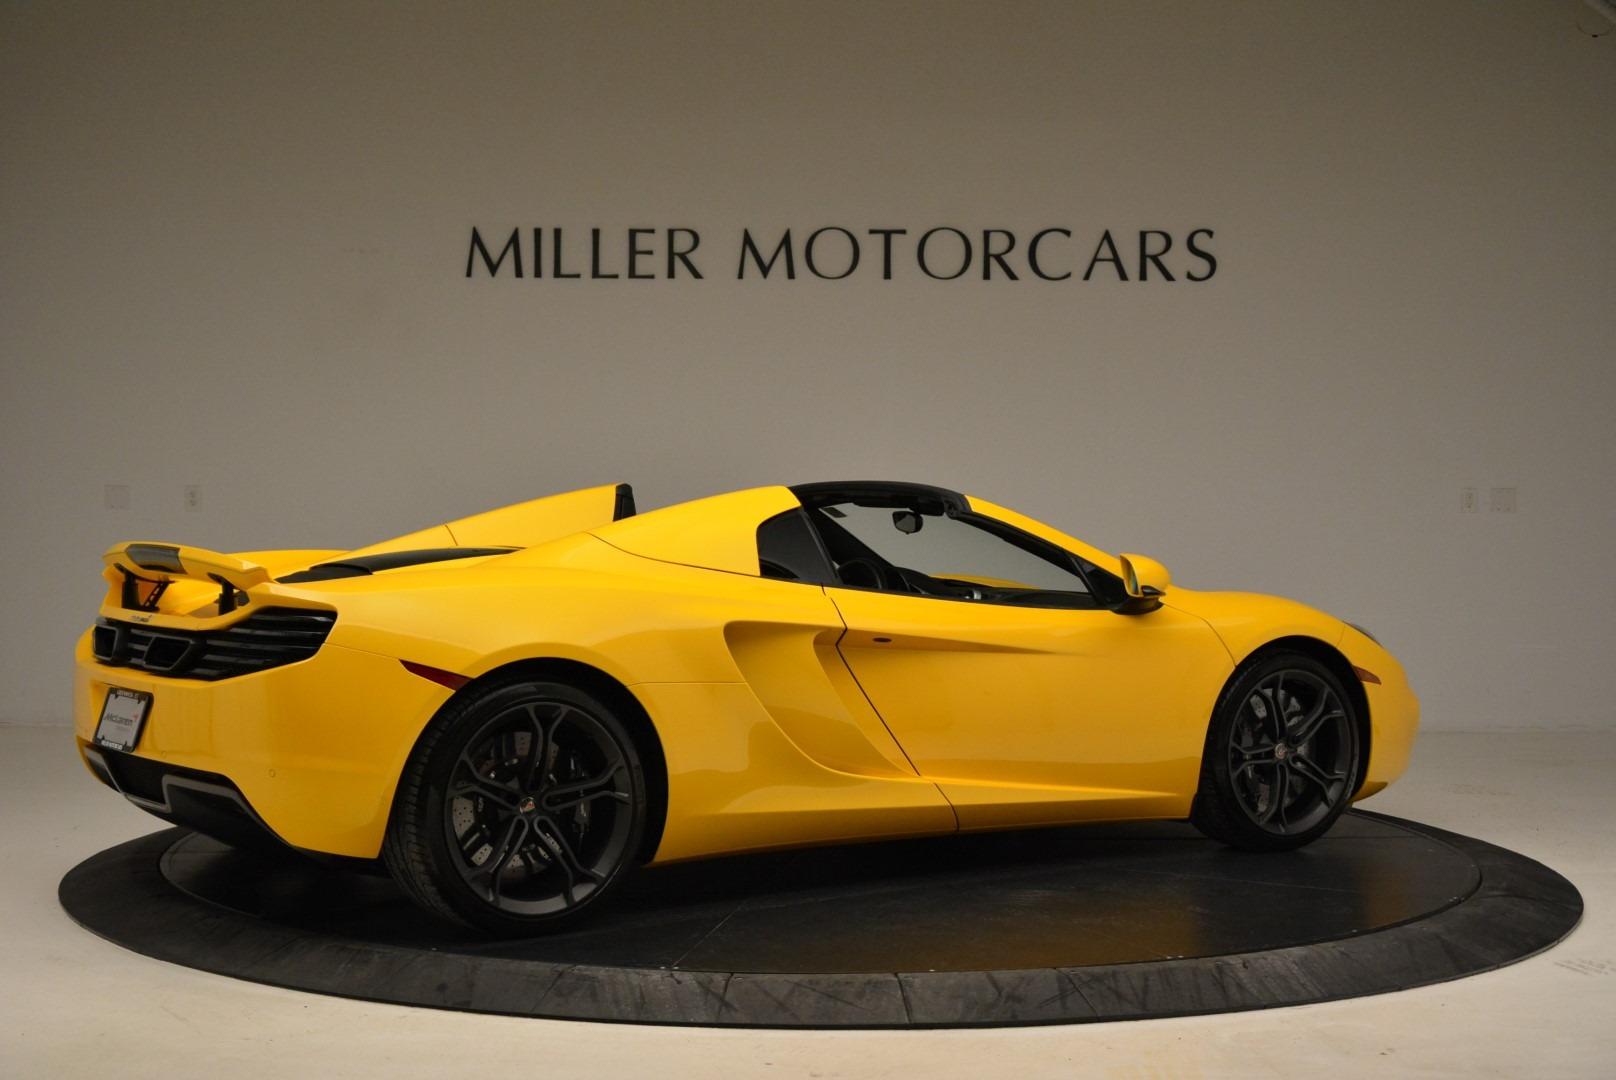 Used 2014 McLaren MP4-12C Spider For Sale In Greenwich, CT. Alfa Romeo of Greenwich, 3134 2057_p8